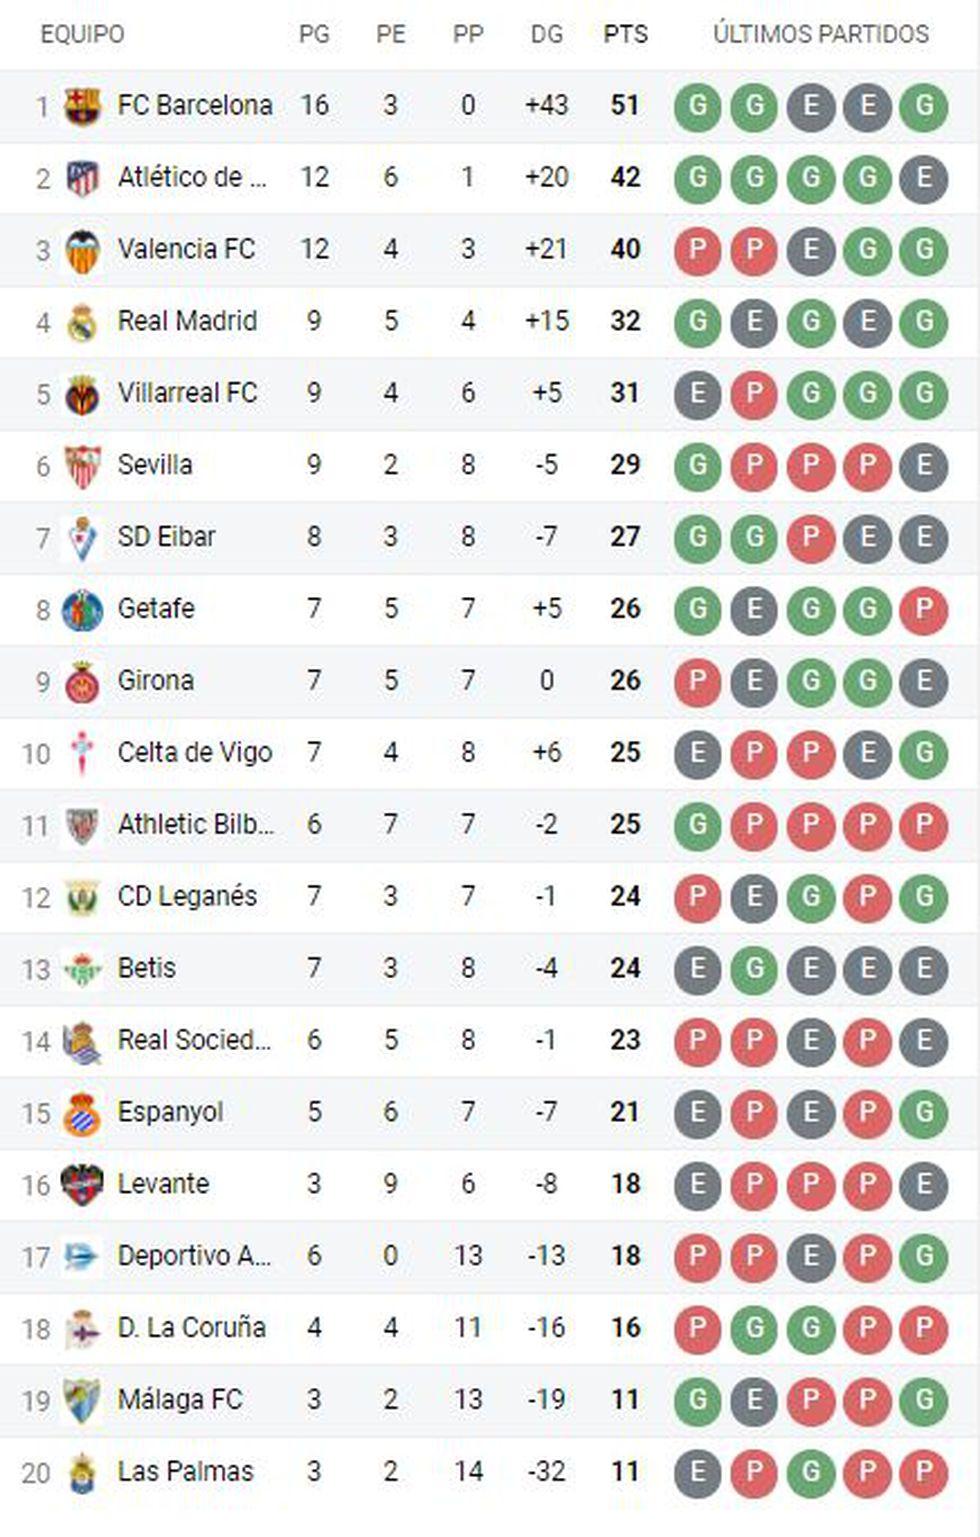 tabla de posiciones de la liga española 2018